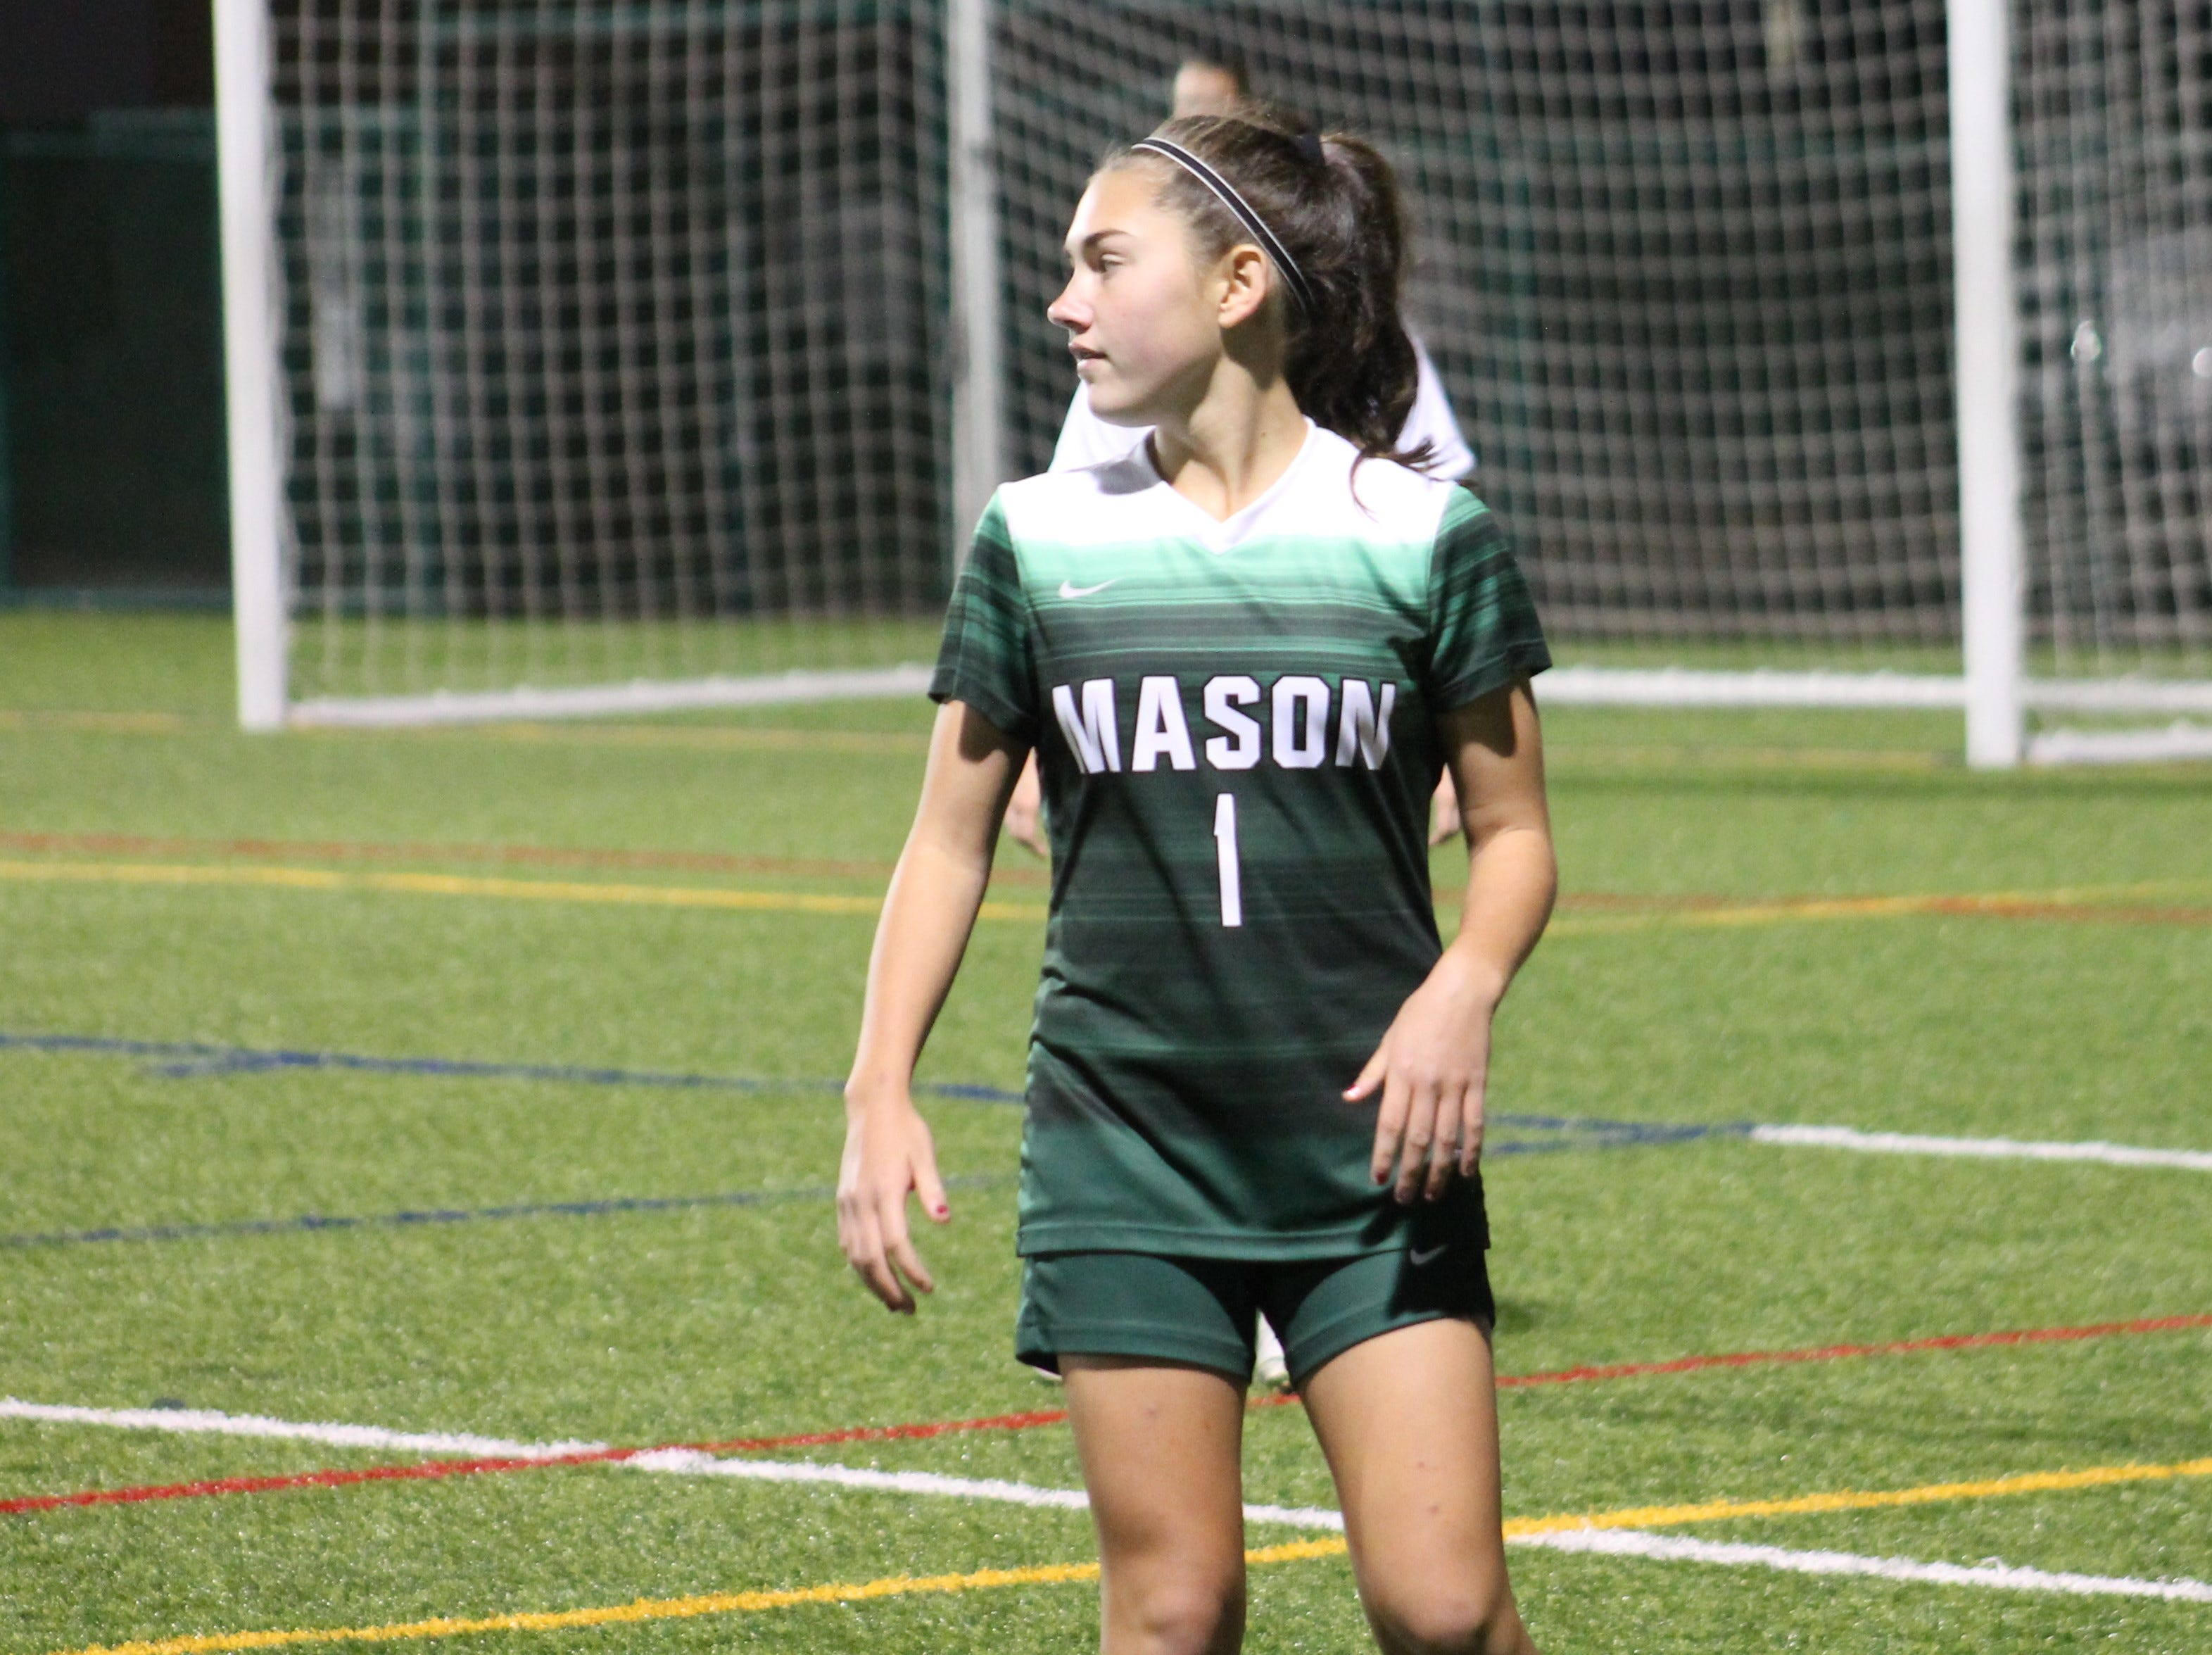 Mason freshman Jayna Searles is on alert